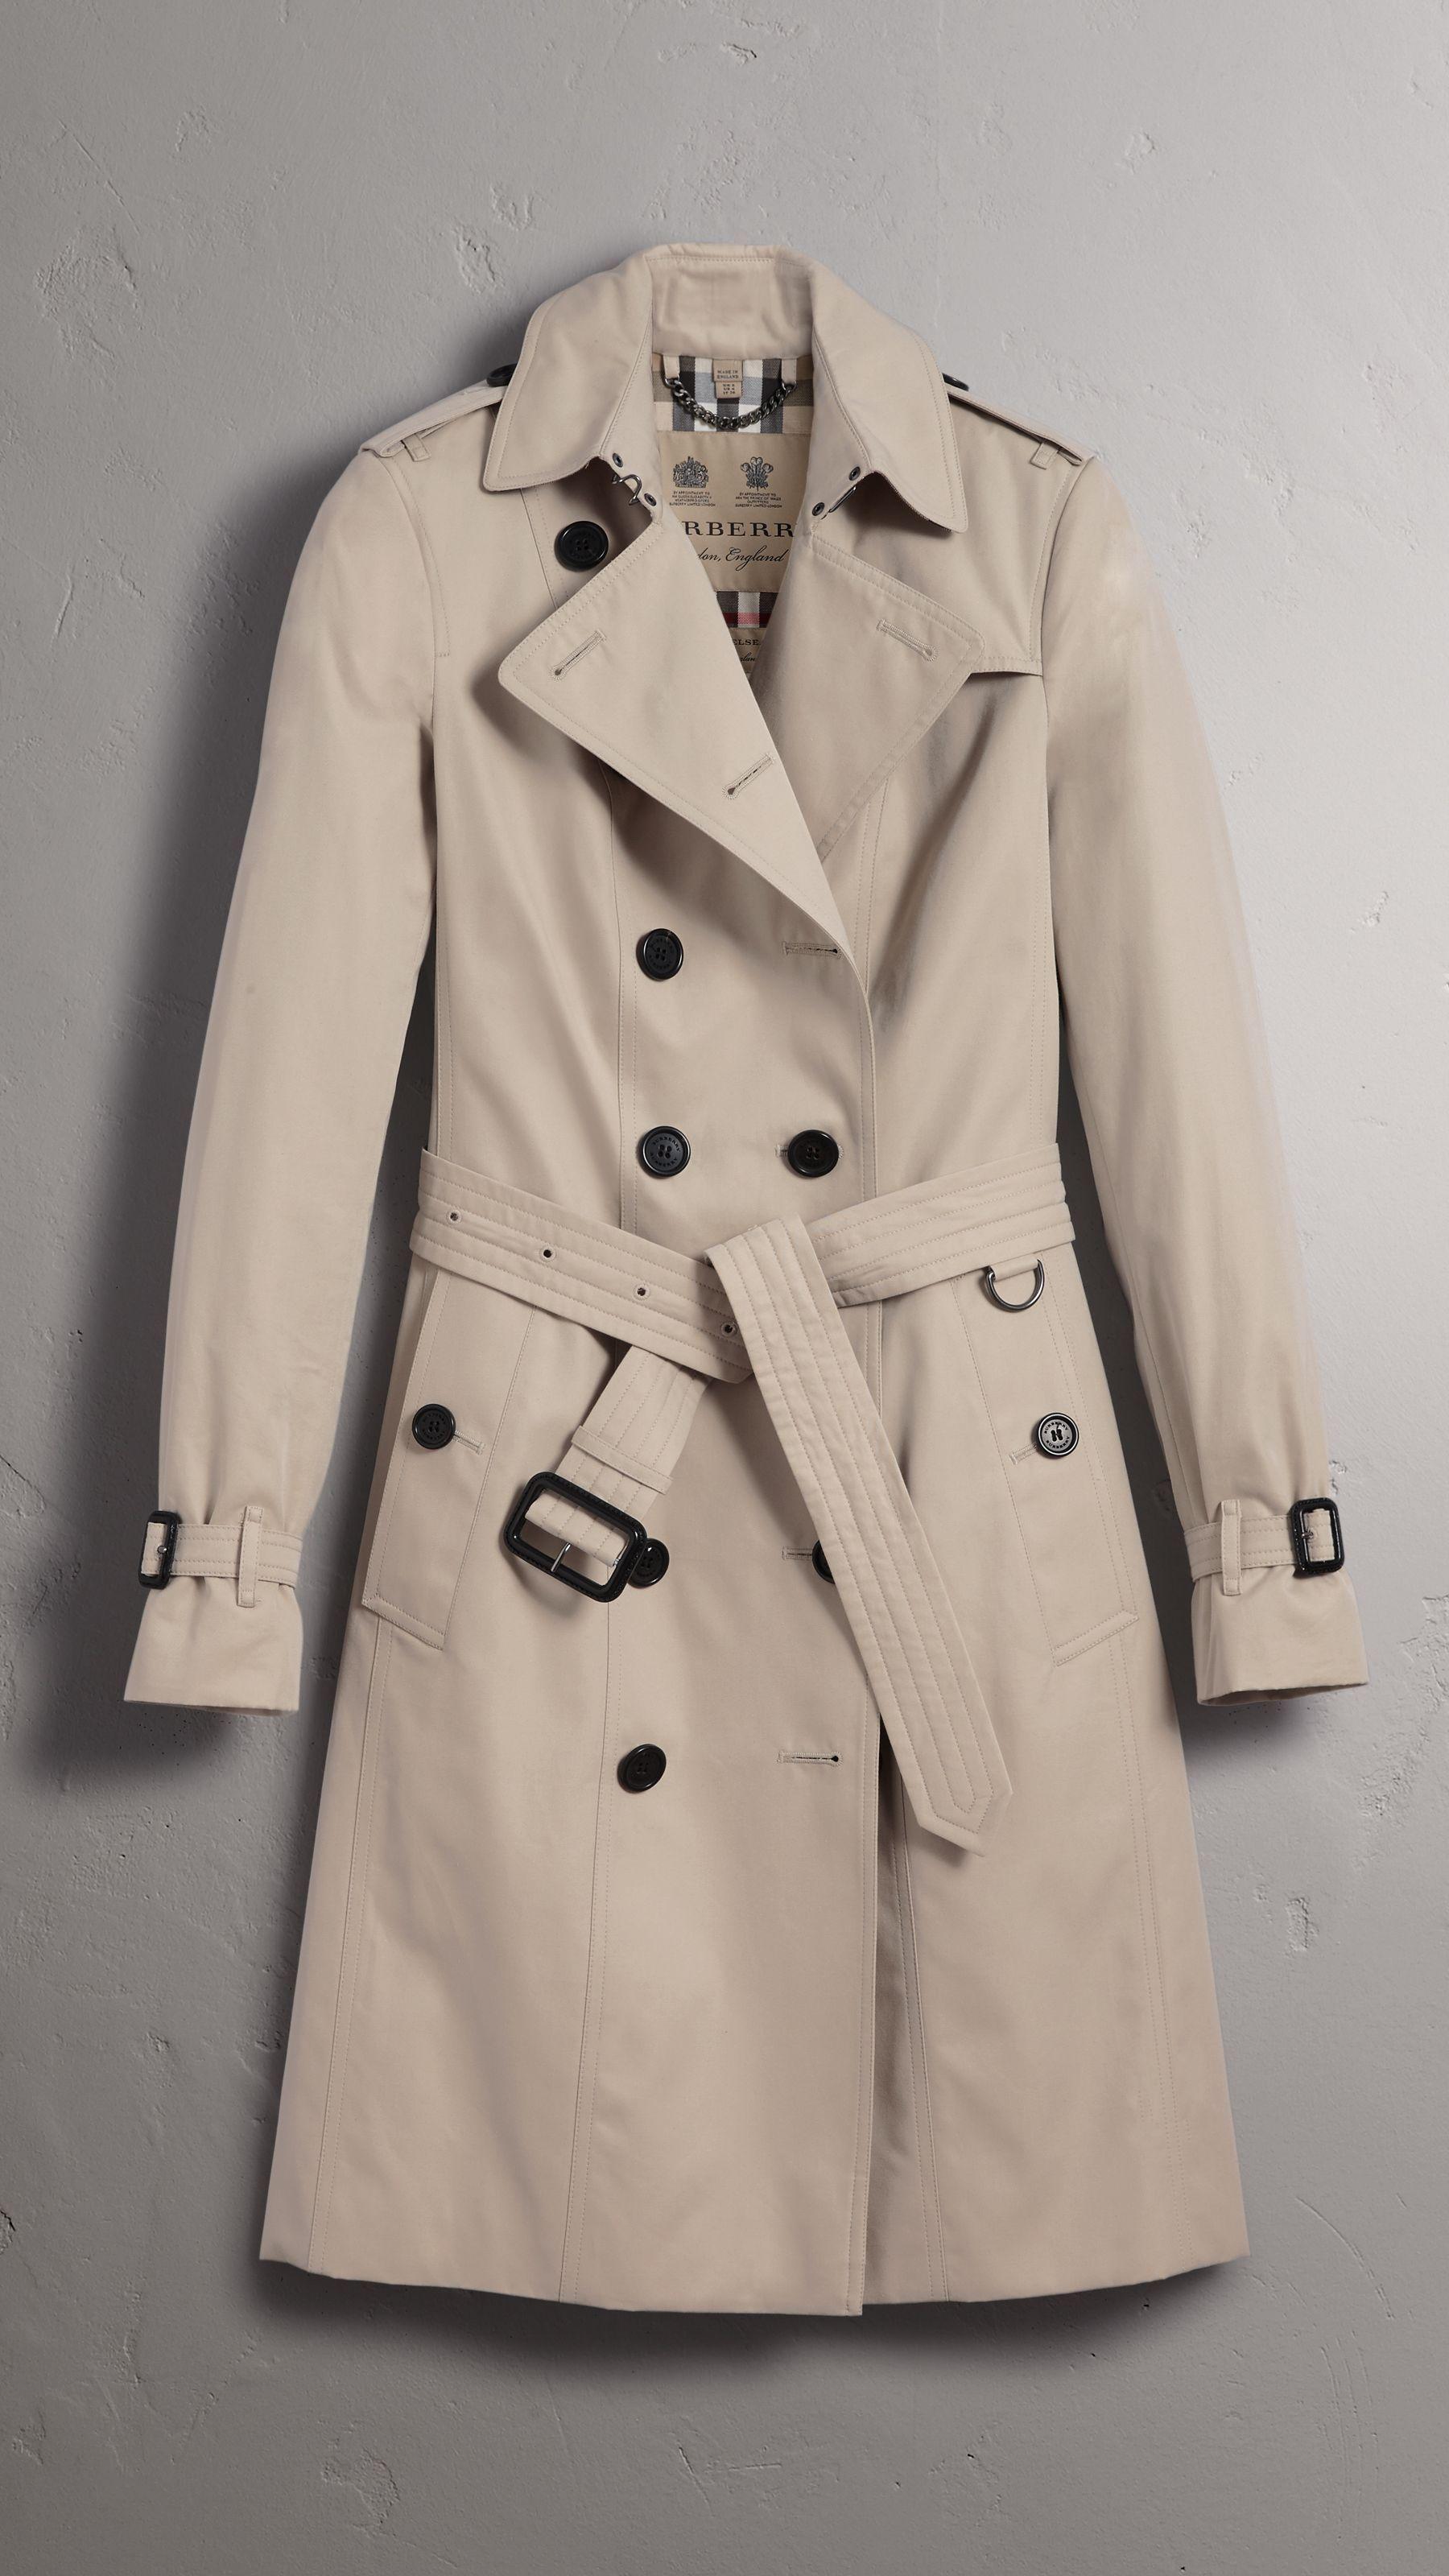 Women's Coats & Jackets in 2019 | Long trench coat, Coats